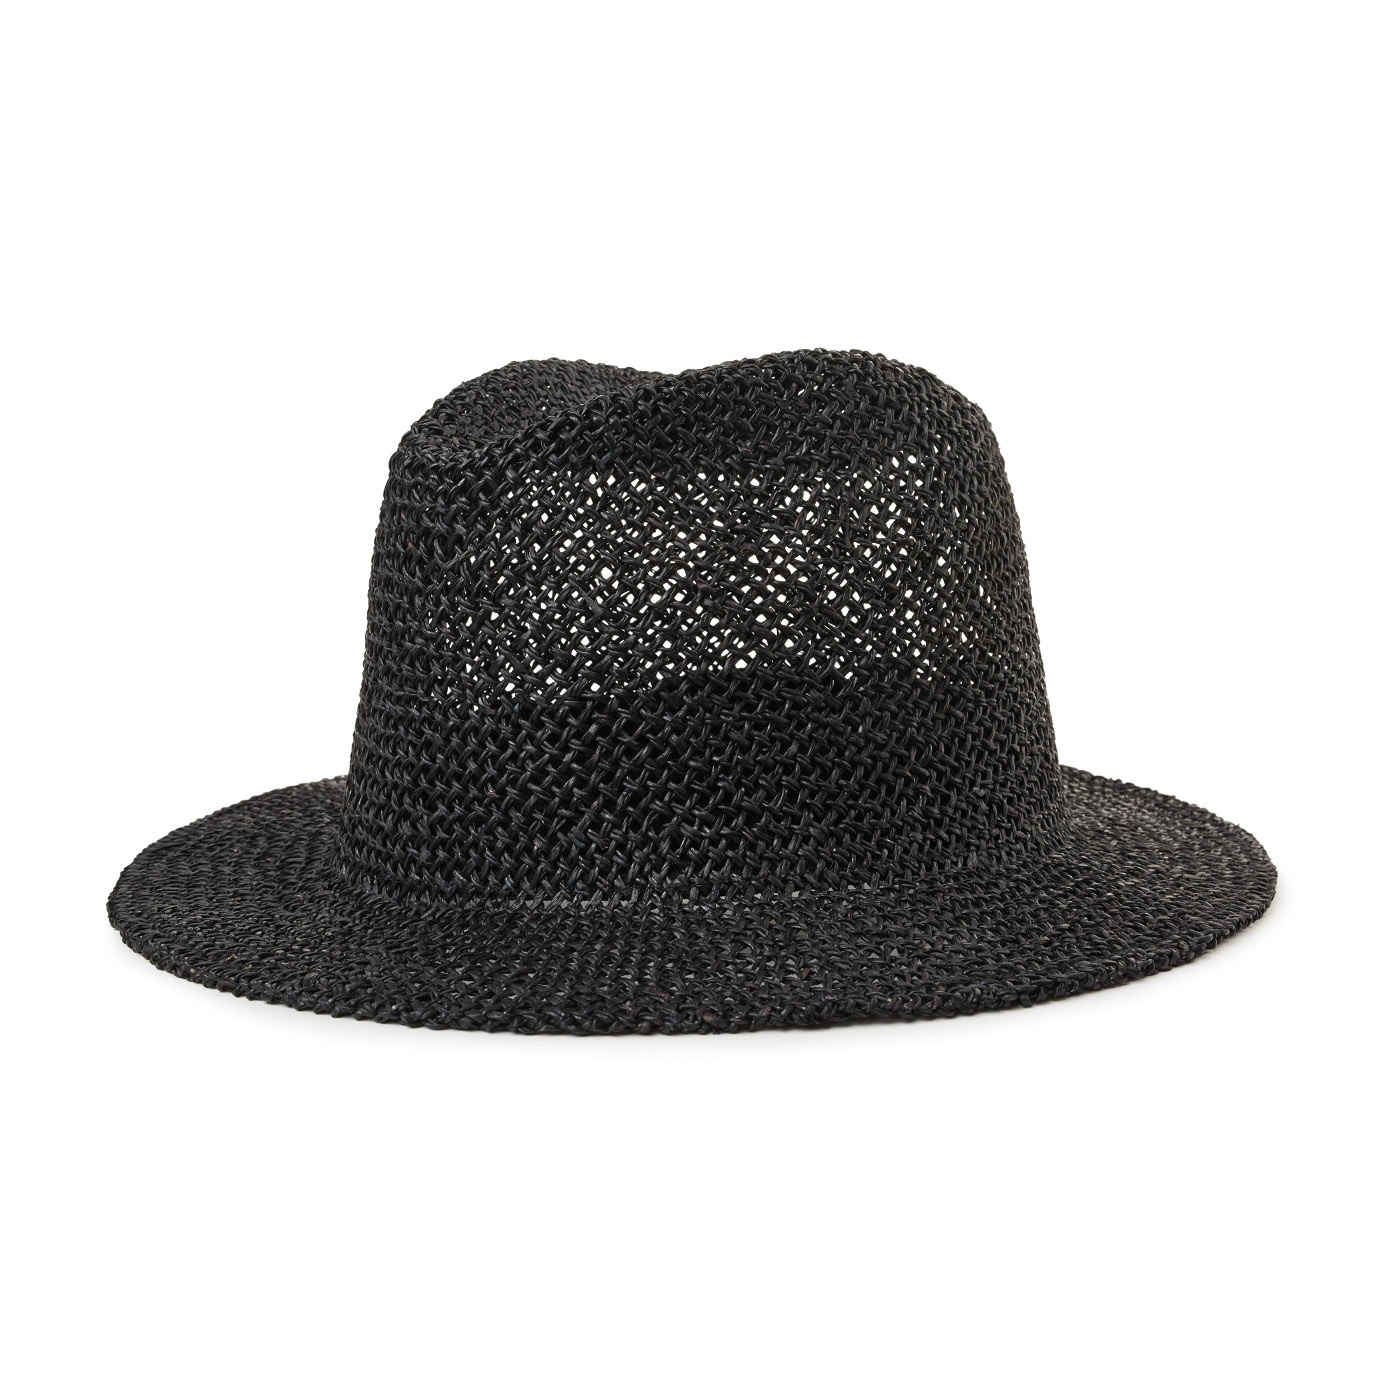 Brixton Dunns chapeau 00923-BLACK-M - Brixton - Modalova